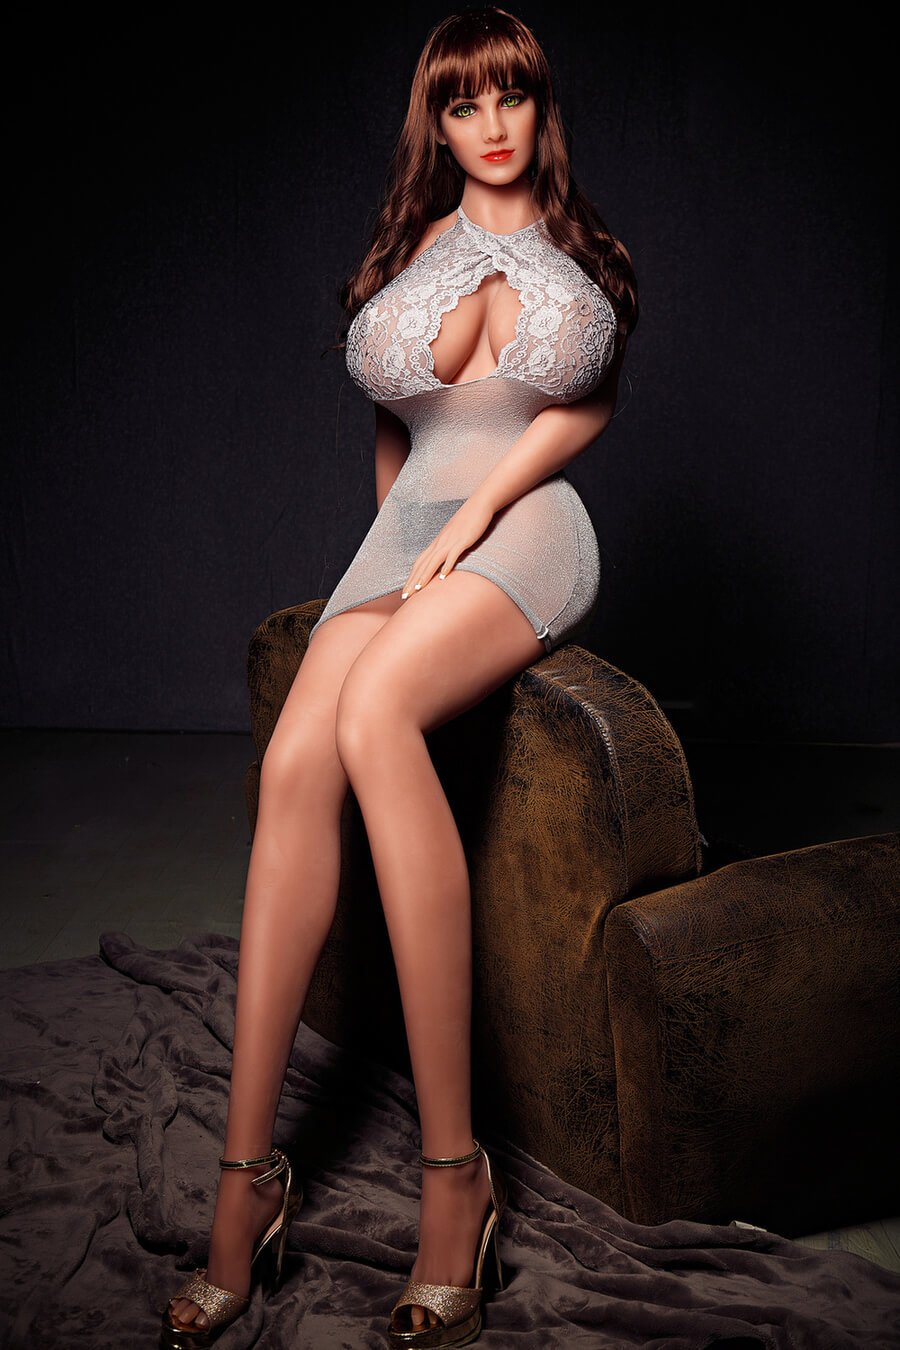 170CM Huge Tit Sex Doll - Ashley